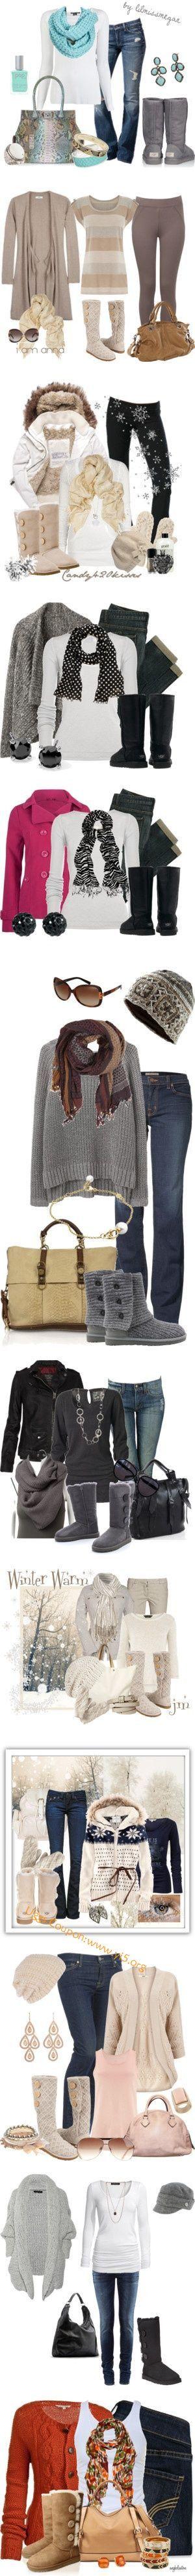 #high_fashion #fall_outfit #womens_fashion